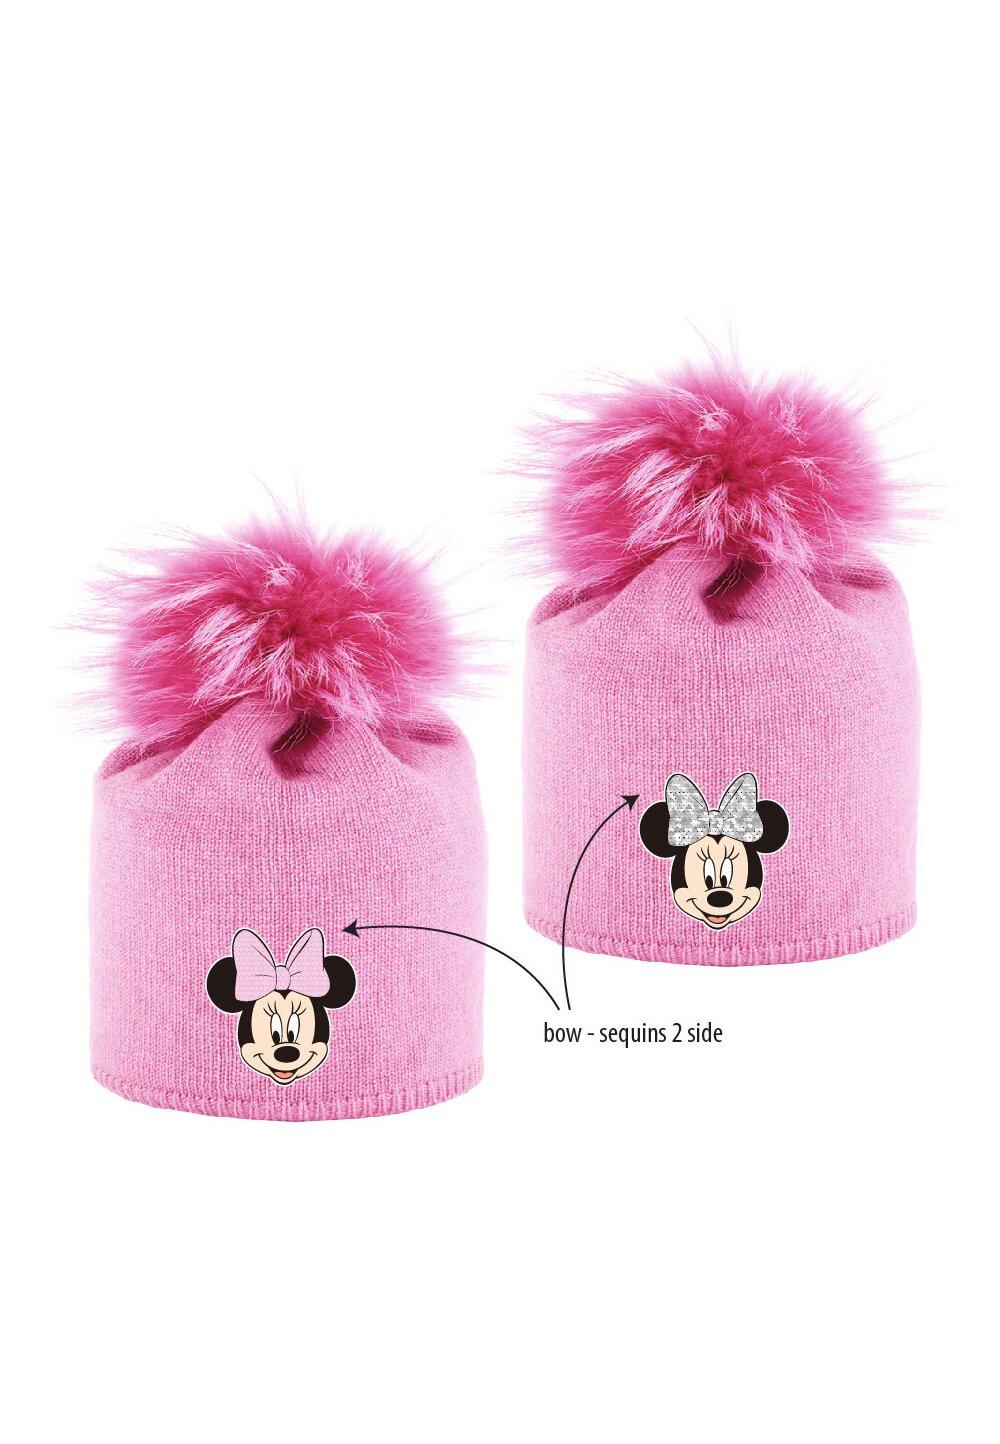 Caciula cu paiete reversibile, Minnie Mouse, roz imagine